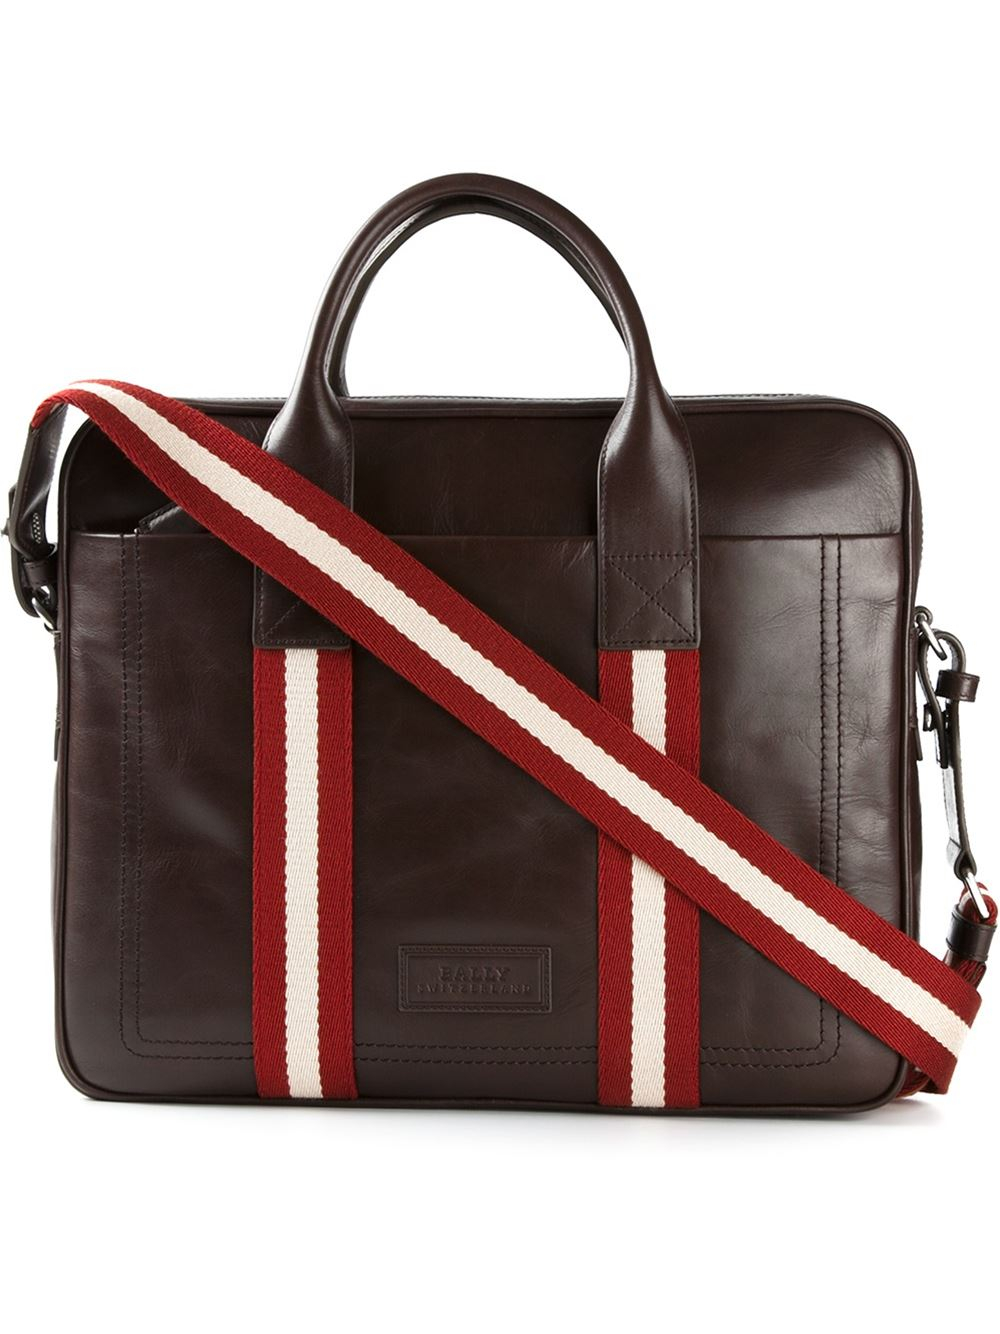 2bdb8d318f0e Lyst - Bally Medium  Tedal  Laptop Bag in Brown for Men